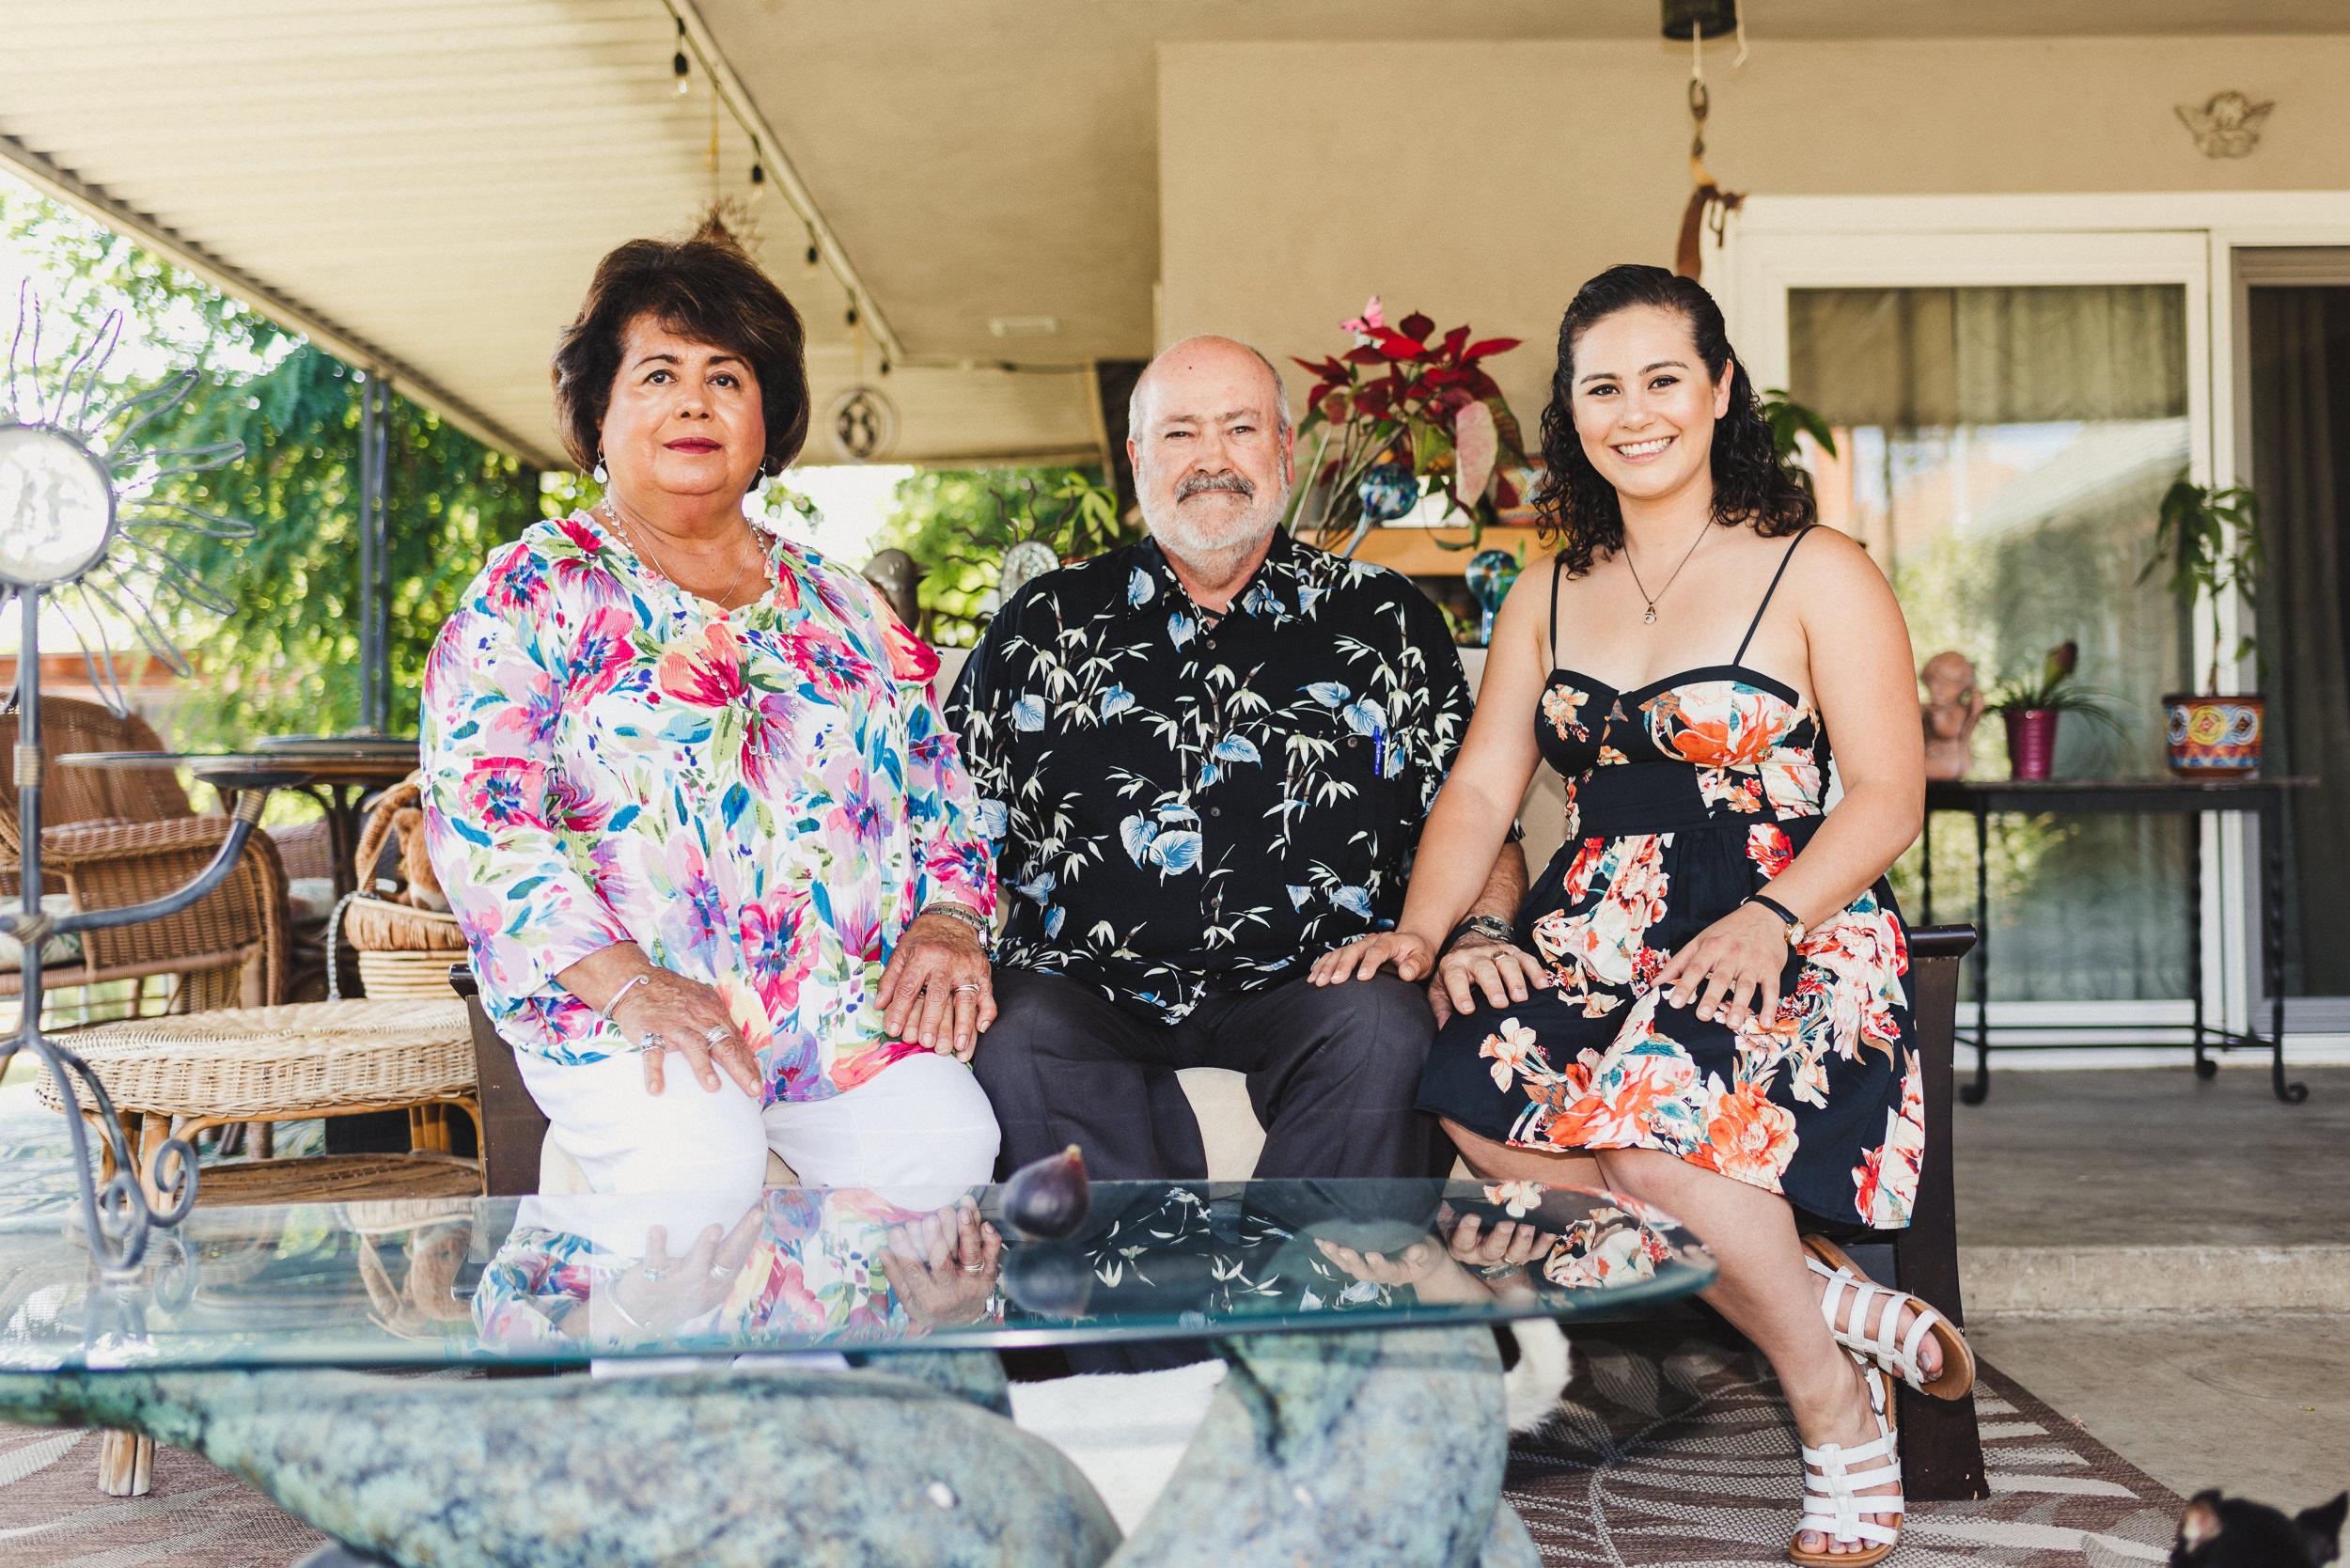 sGutierrez Family - Summer 2018-31.jpg